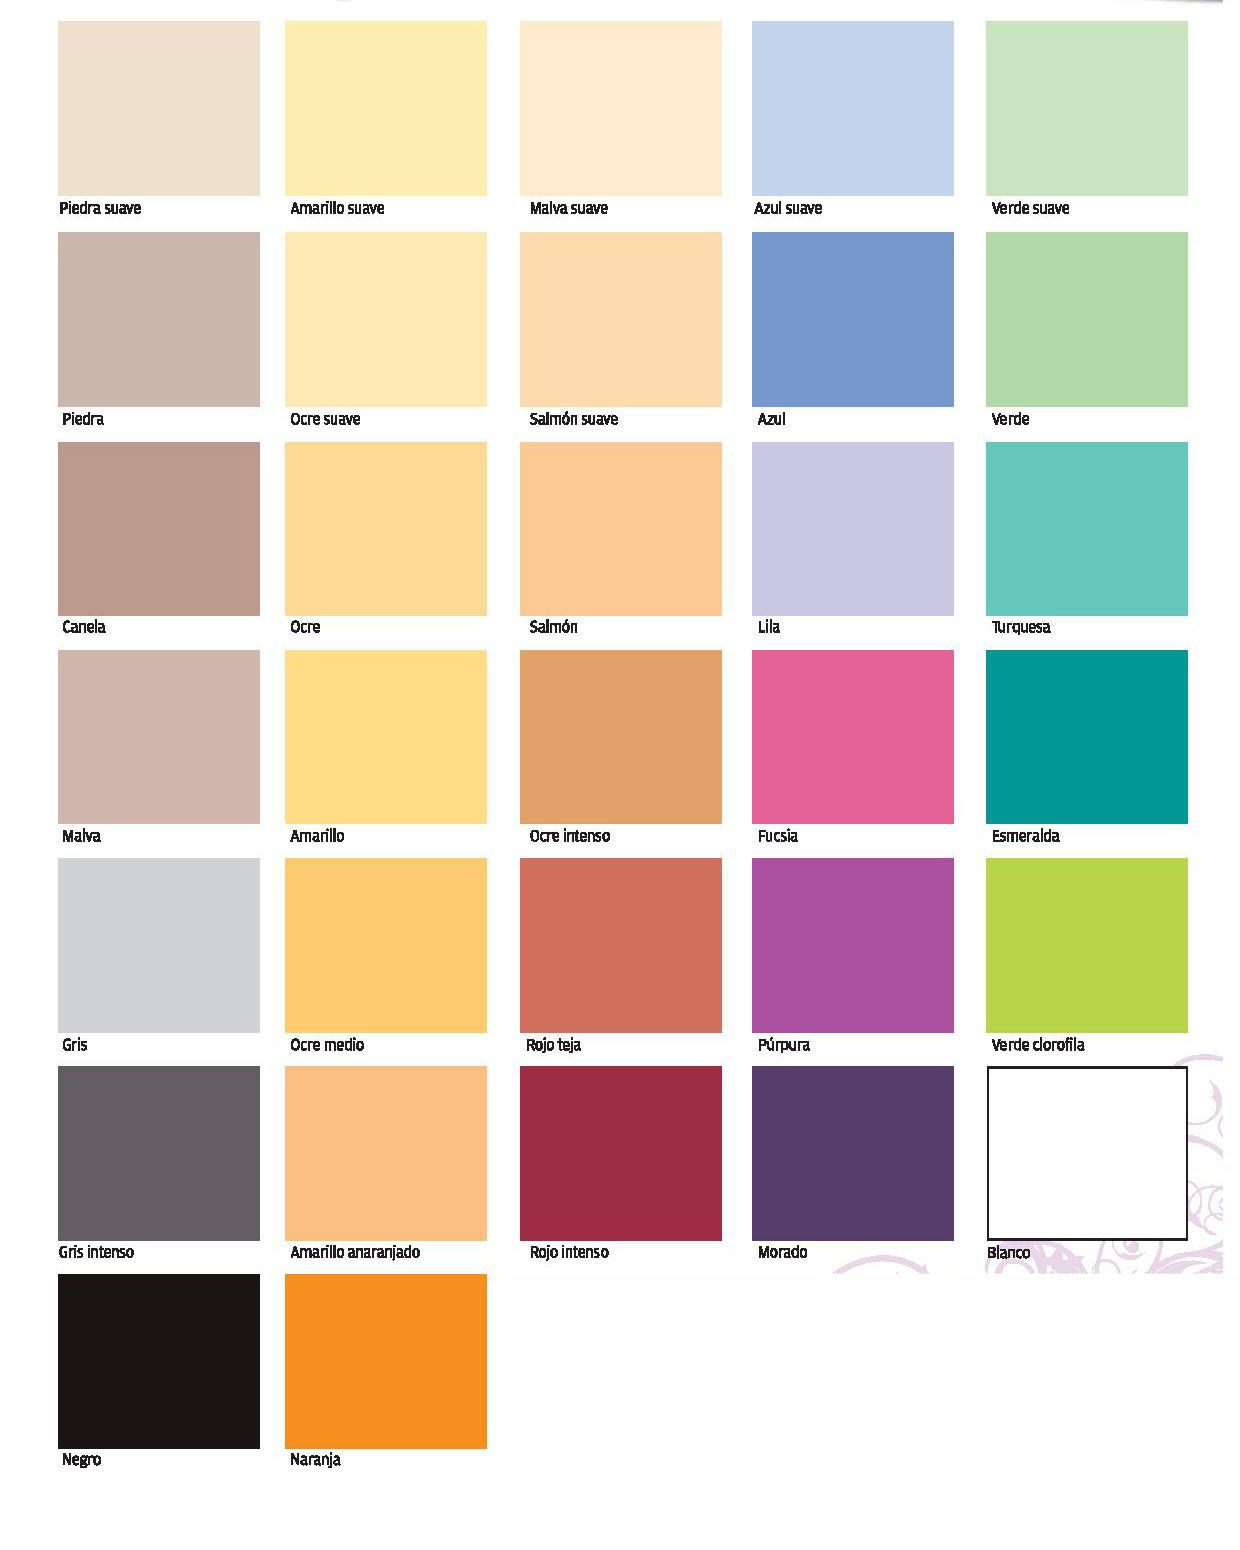 Carta de colores titan paletas en 2019 colores de - Carta de colores para pintar paredes interiores ...